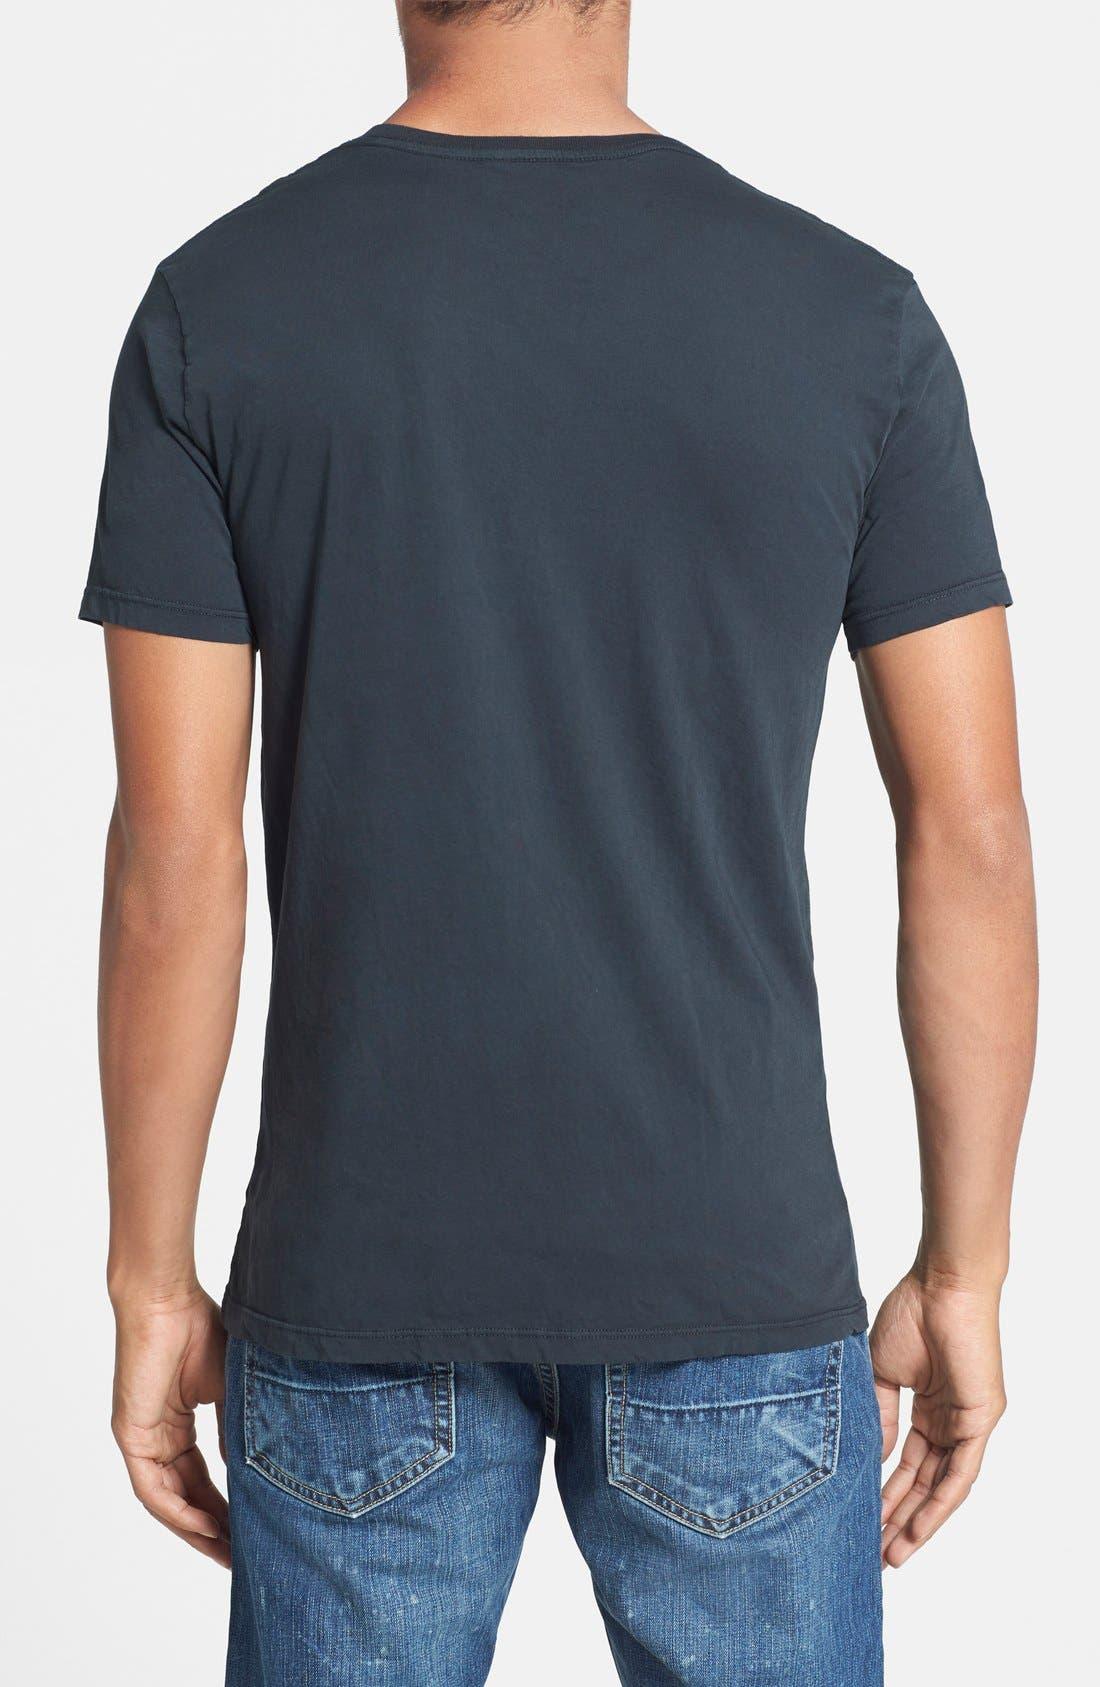 Alternate Image 2  - Scott Free 'Fired Up' Graphic V-Neck T-Shirt